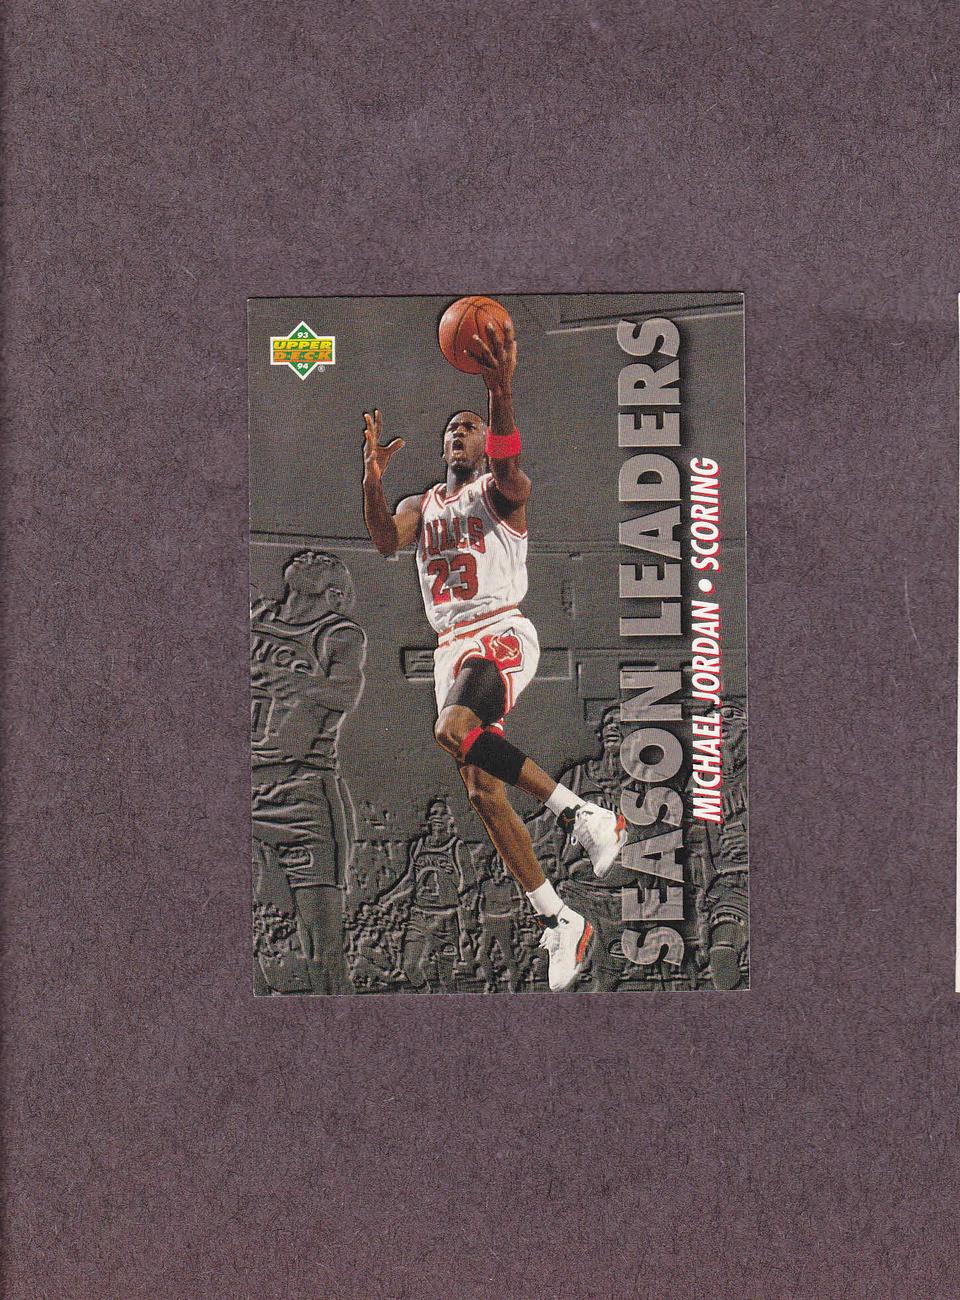 1993-94 Upper Deck # 166 Michael Jordan Chicago Bulls NM